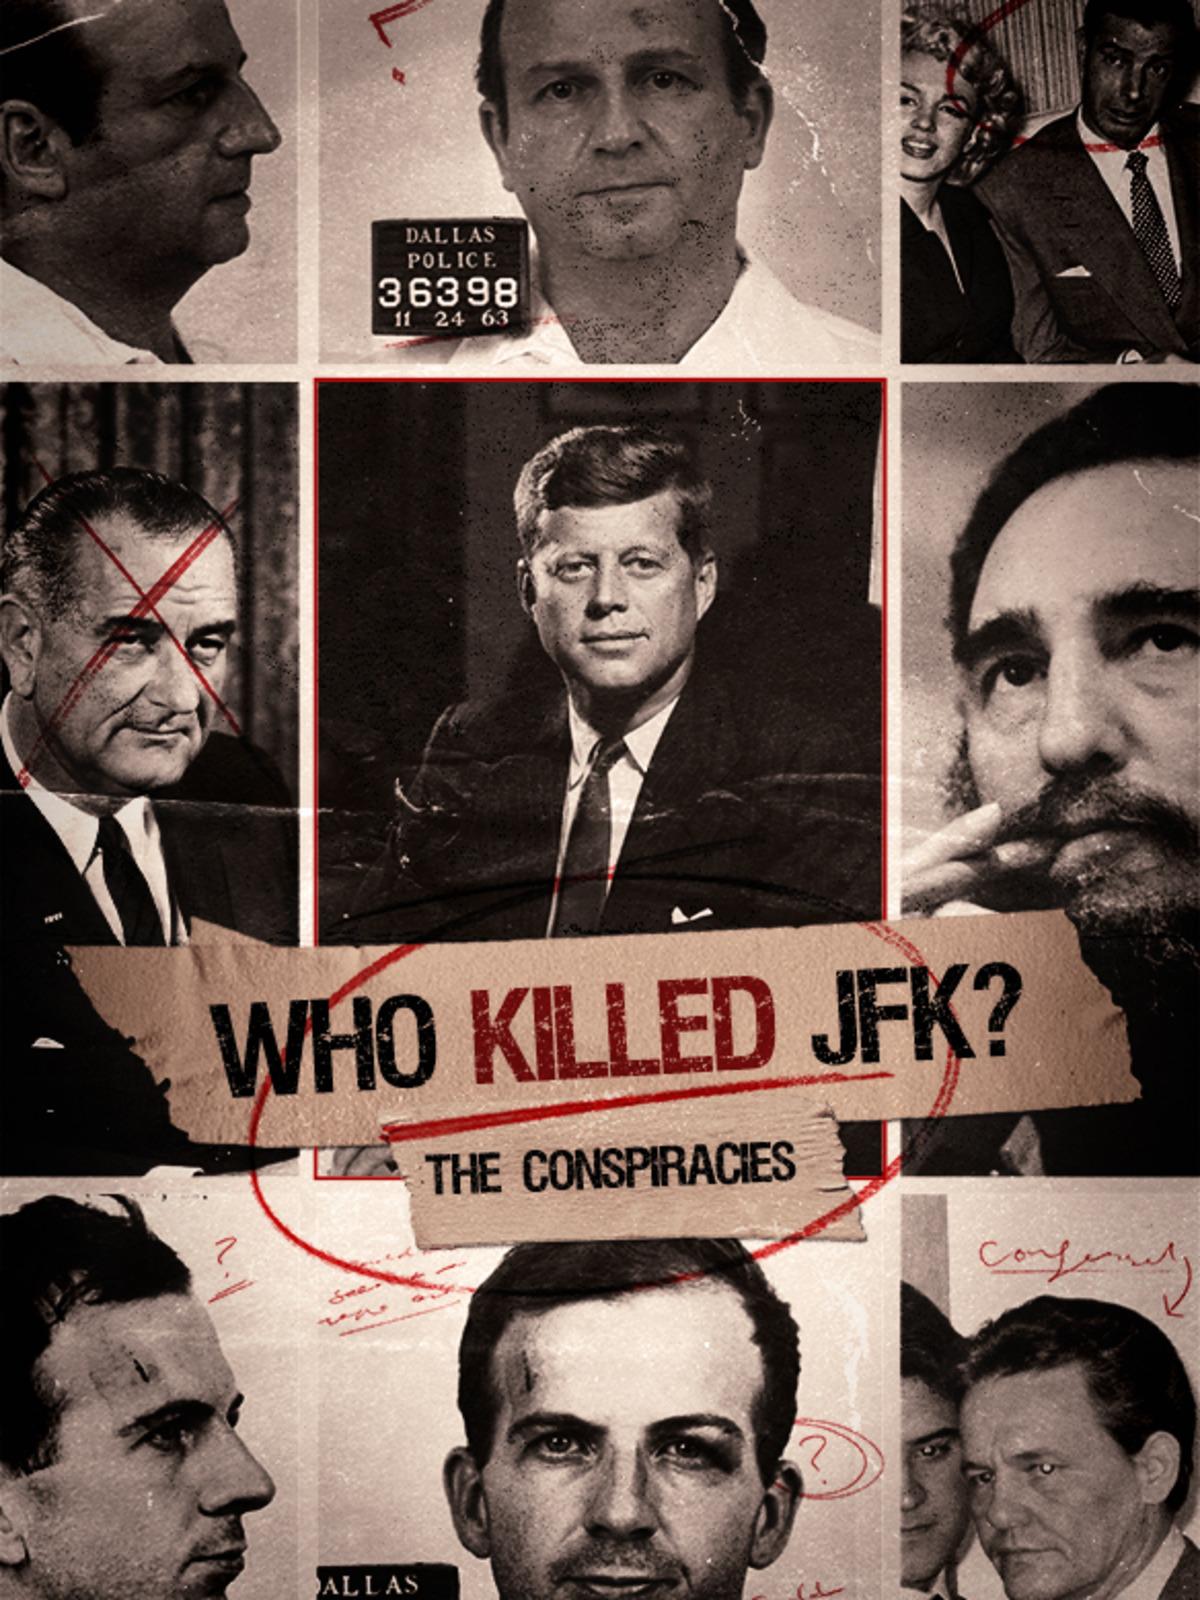 Who Killed JFK? The Conspiracies